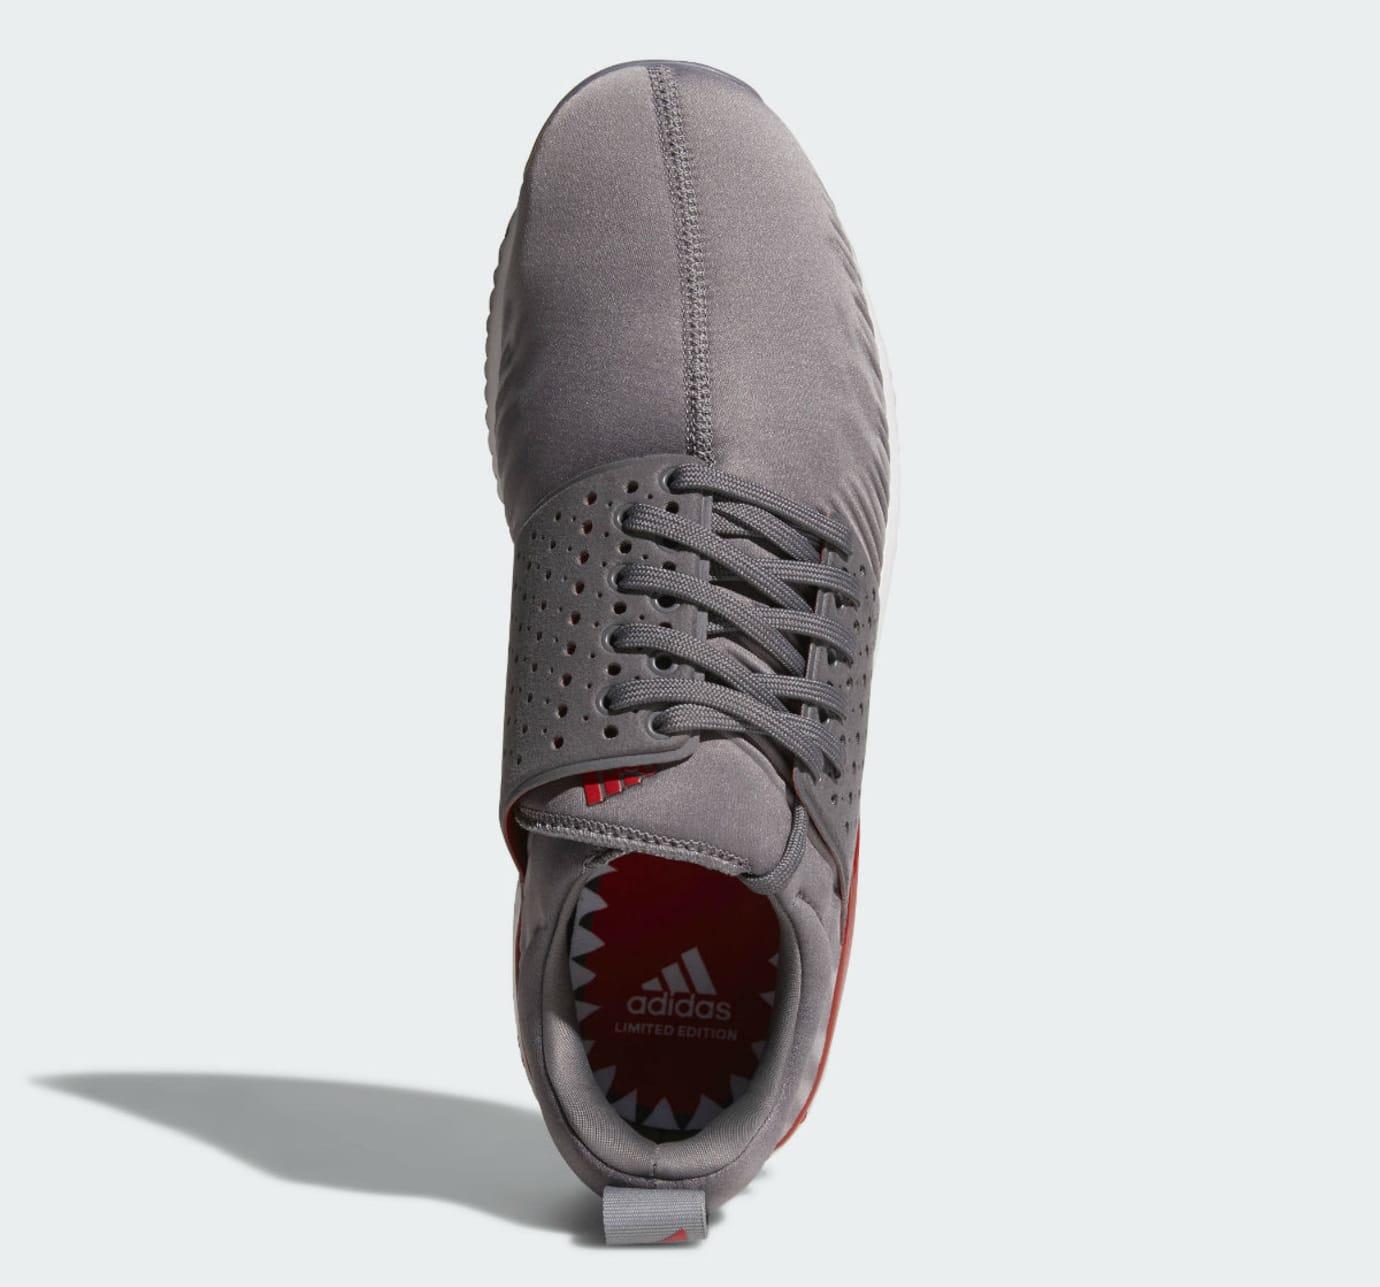 3eb6bdc1abb Adidas Adicross Bounce Niuhi Release Date AC8212 Top